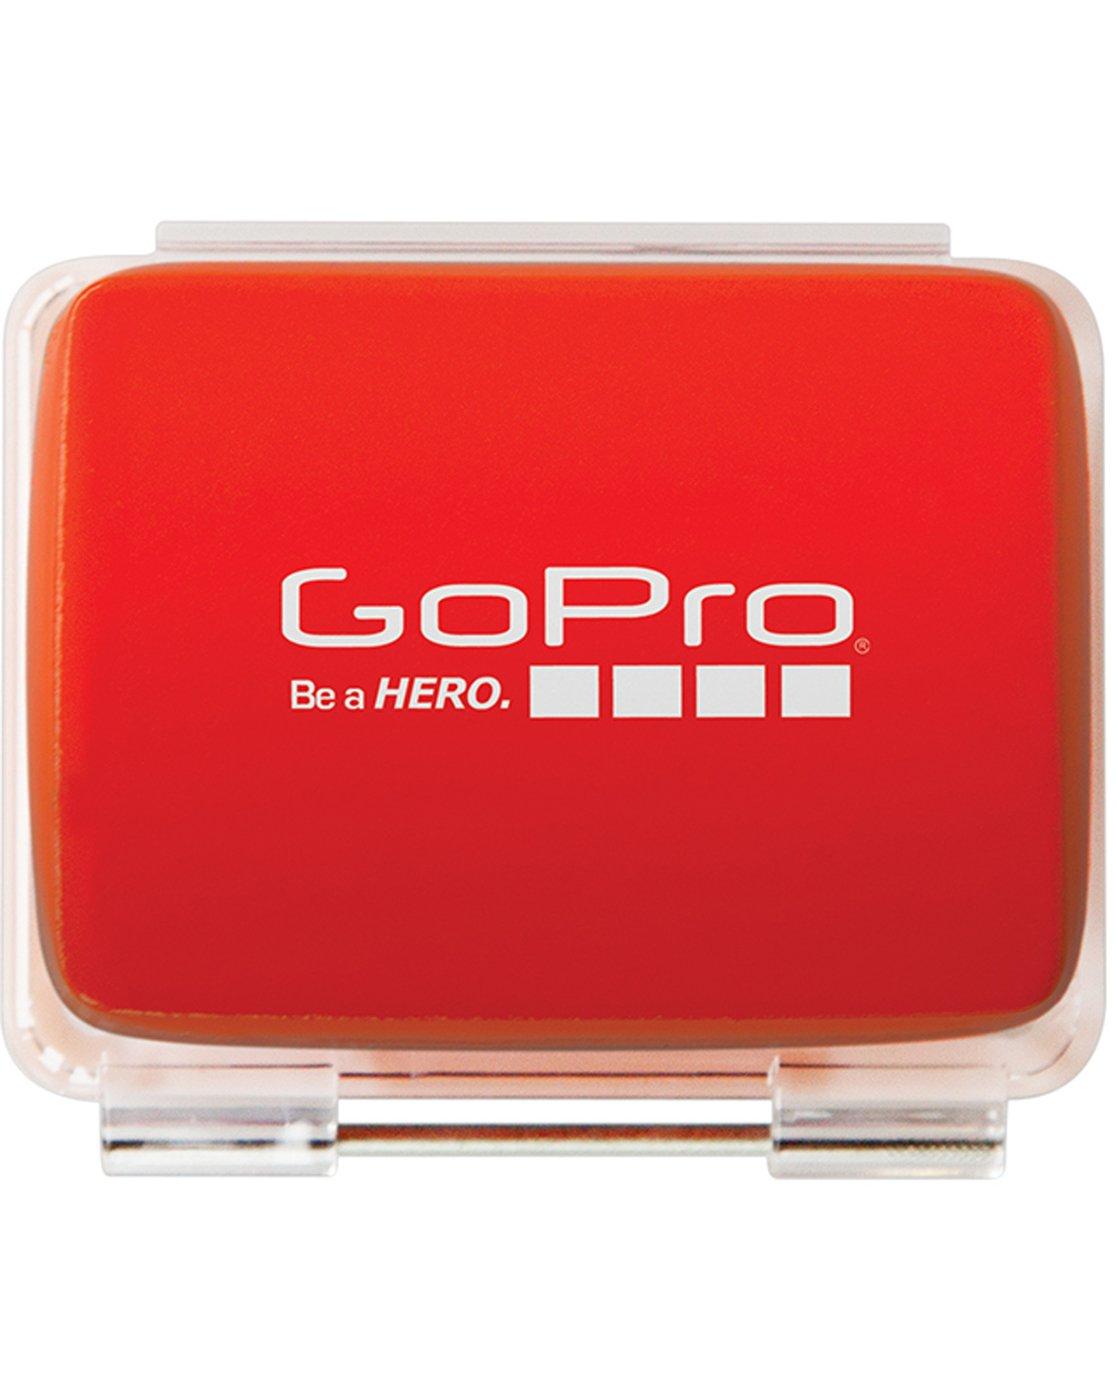 Keeps your GoPro afloat GoPro Floaty Backdoor